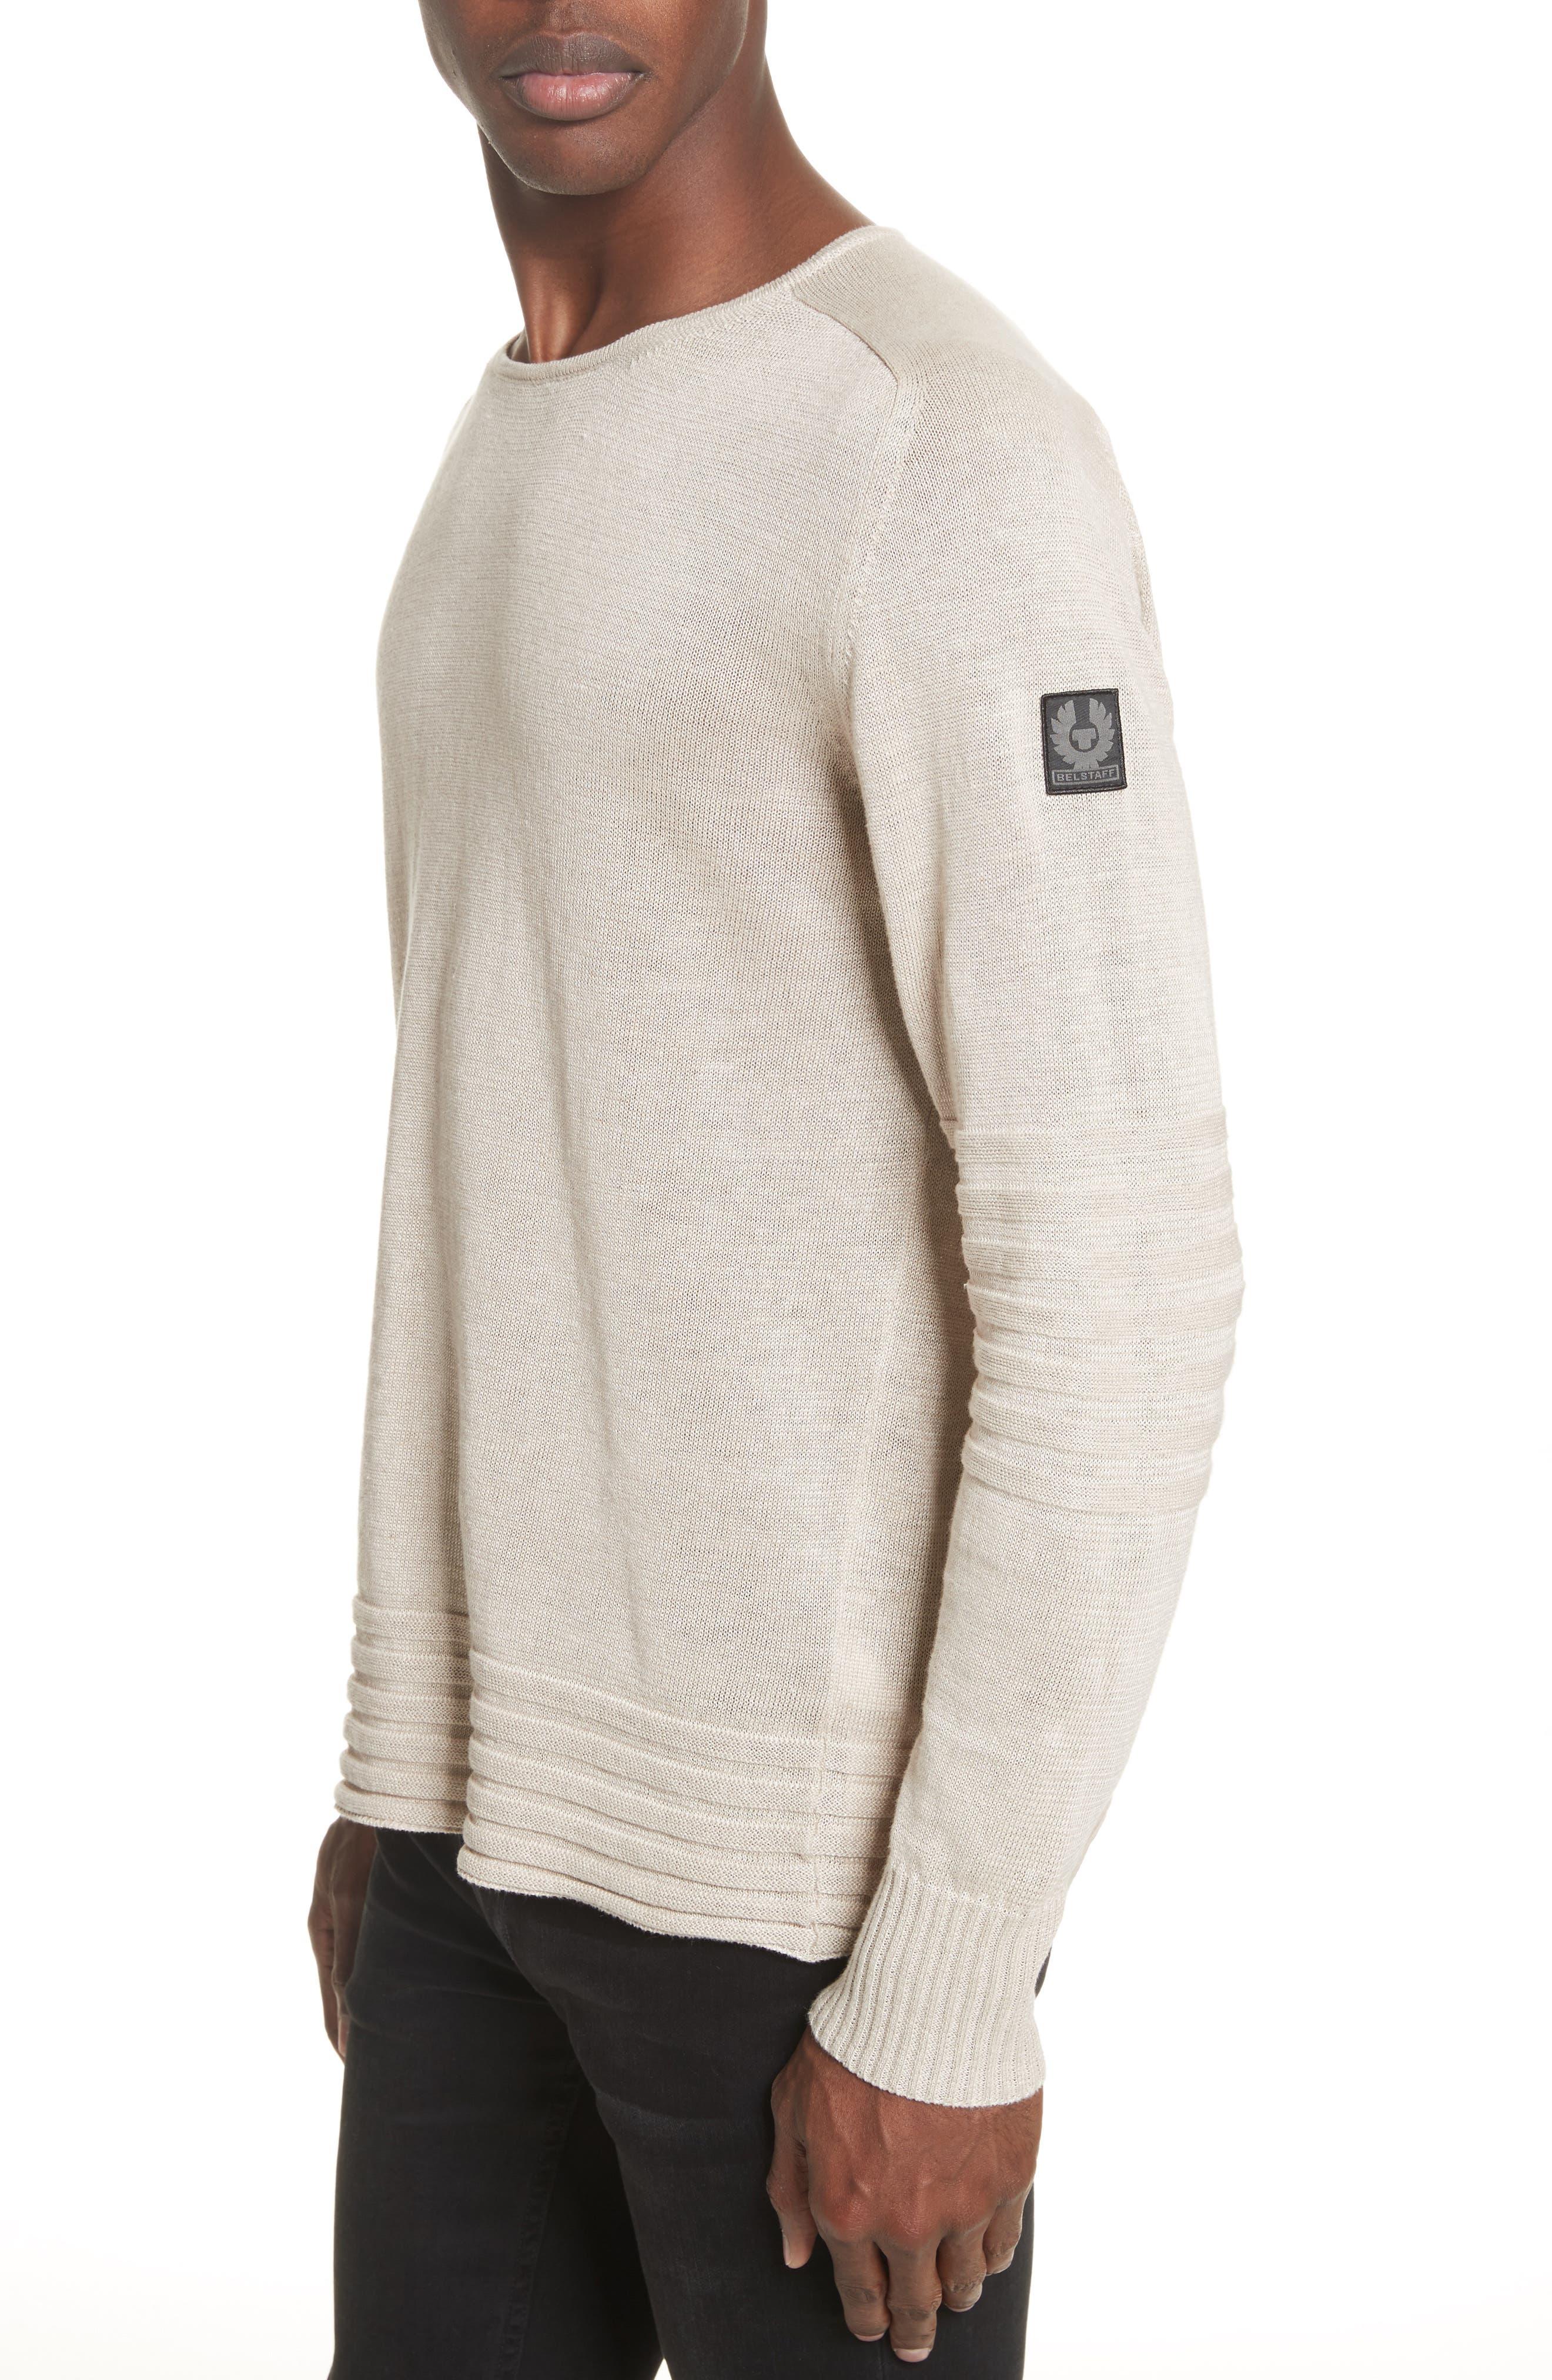 Exford Linen Crewneck Sweater,                             Alternate thumbnail 3, color,                             Light Sand